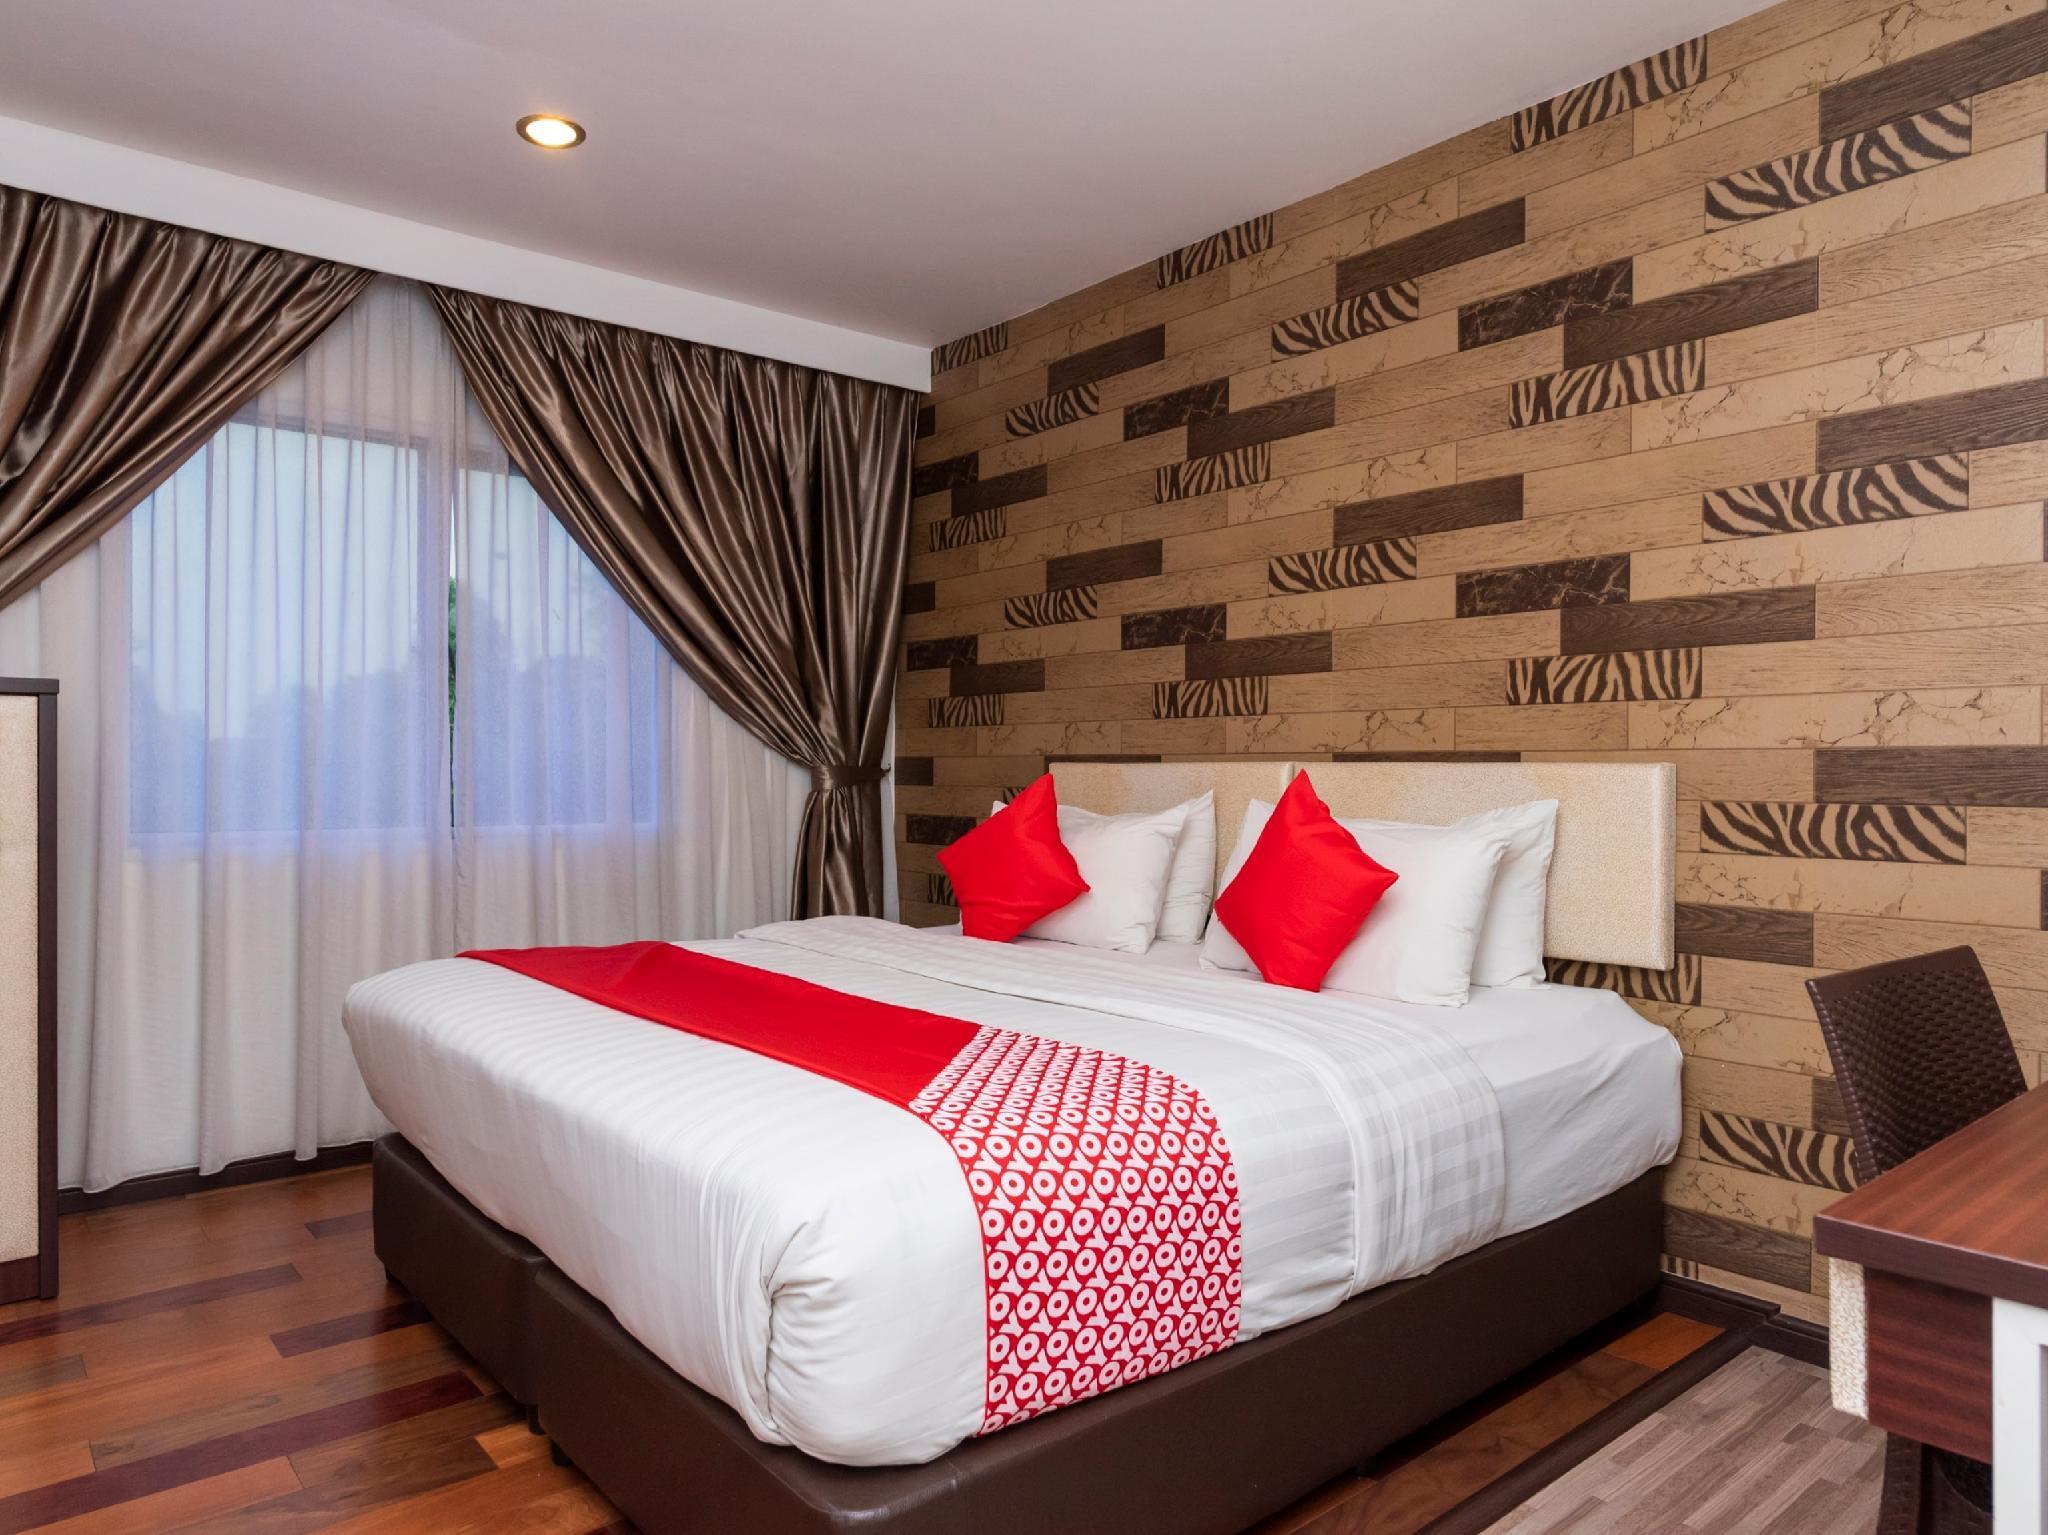 OYO 1117 Okid Hotel, Johor Bahru